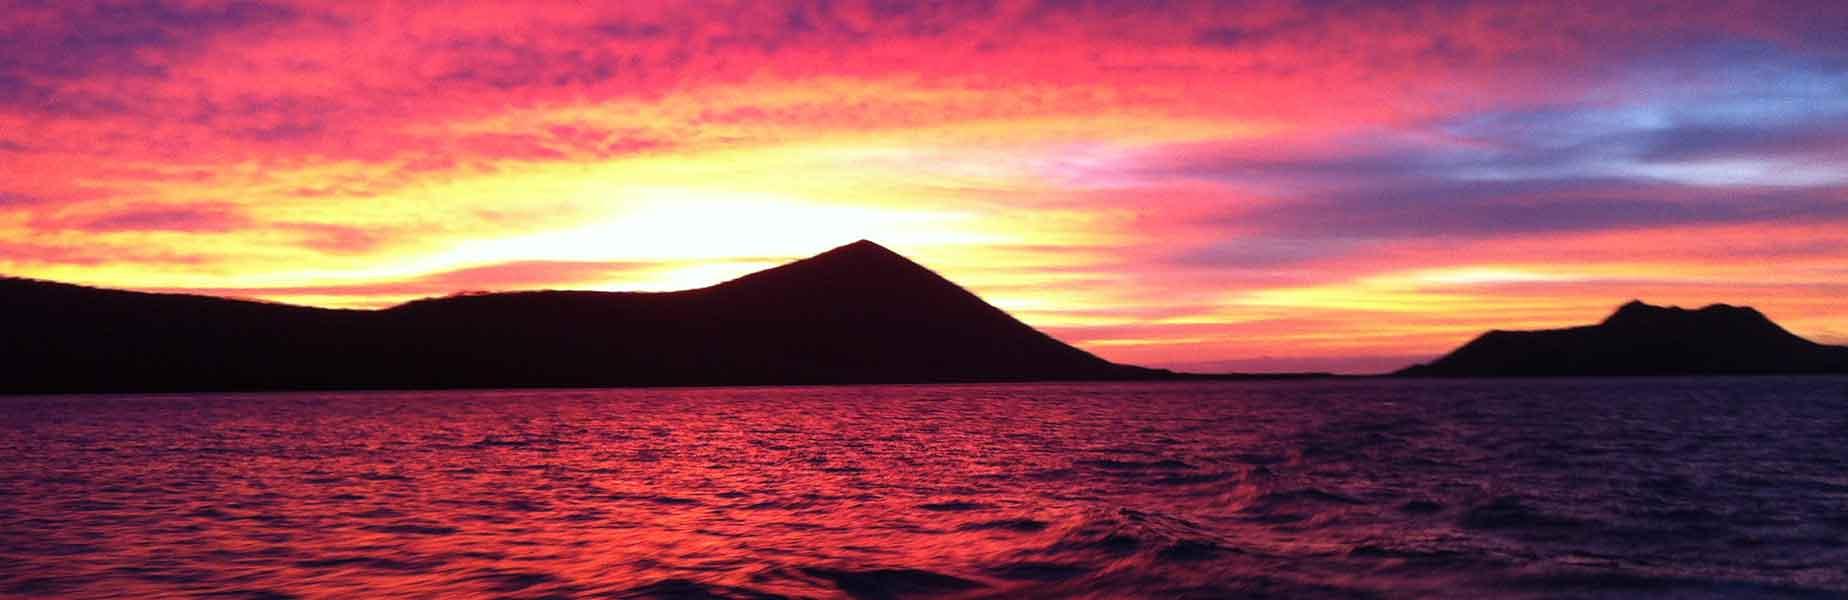 days trips in ecuador and galapagos